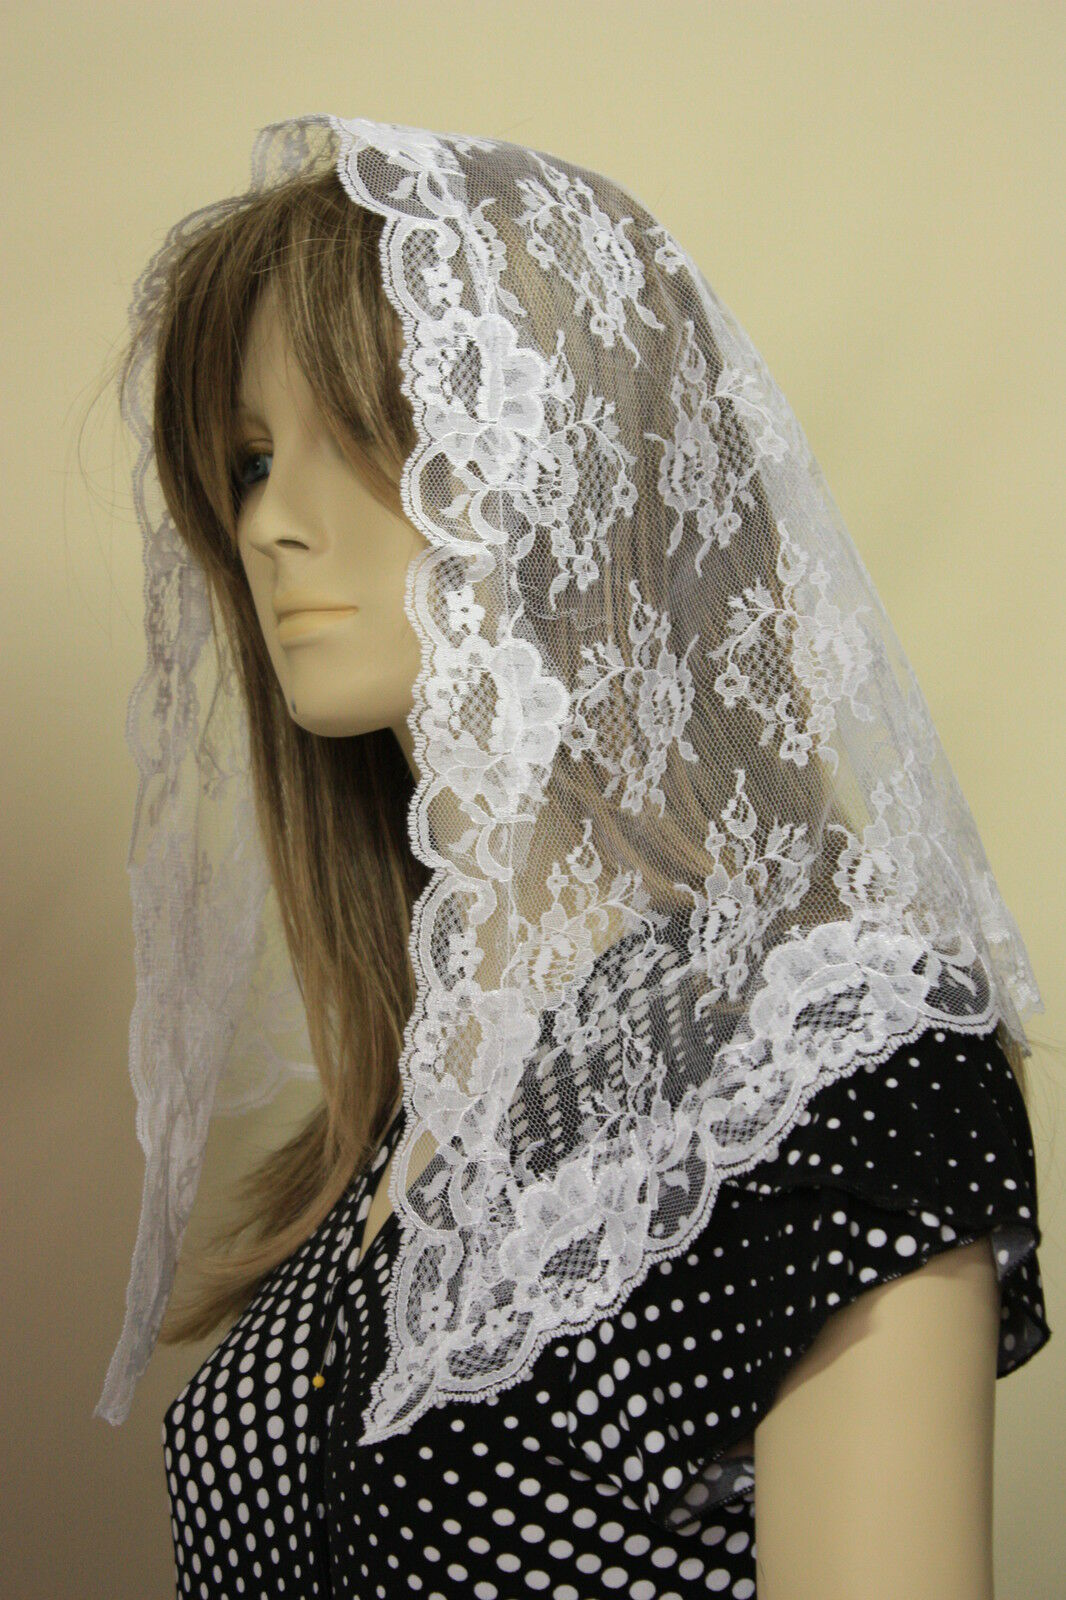 Ivory veils and mantilla Catholic church chapel scarf lace latin mass IVN